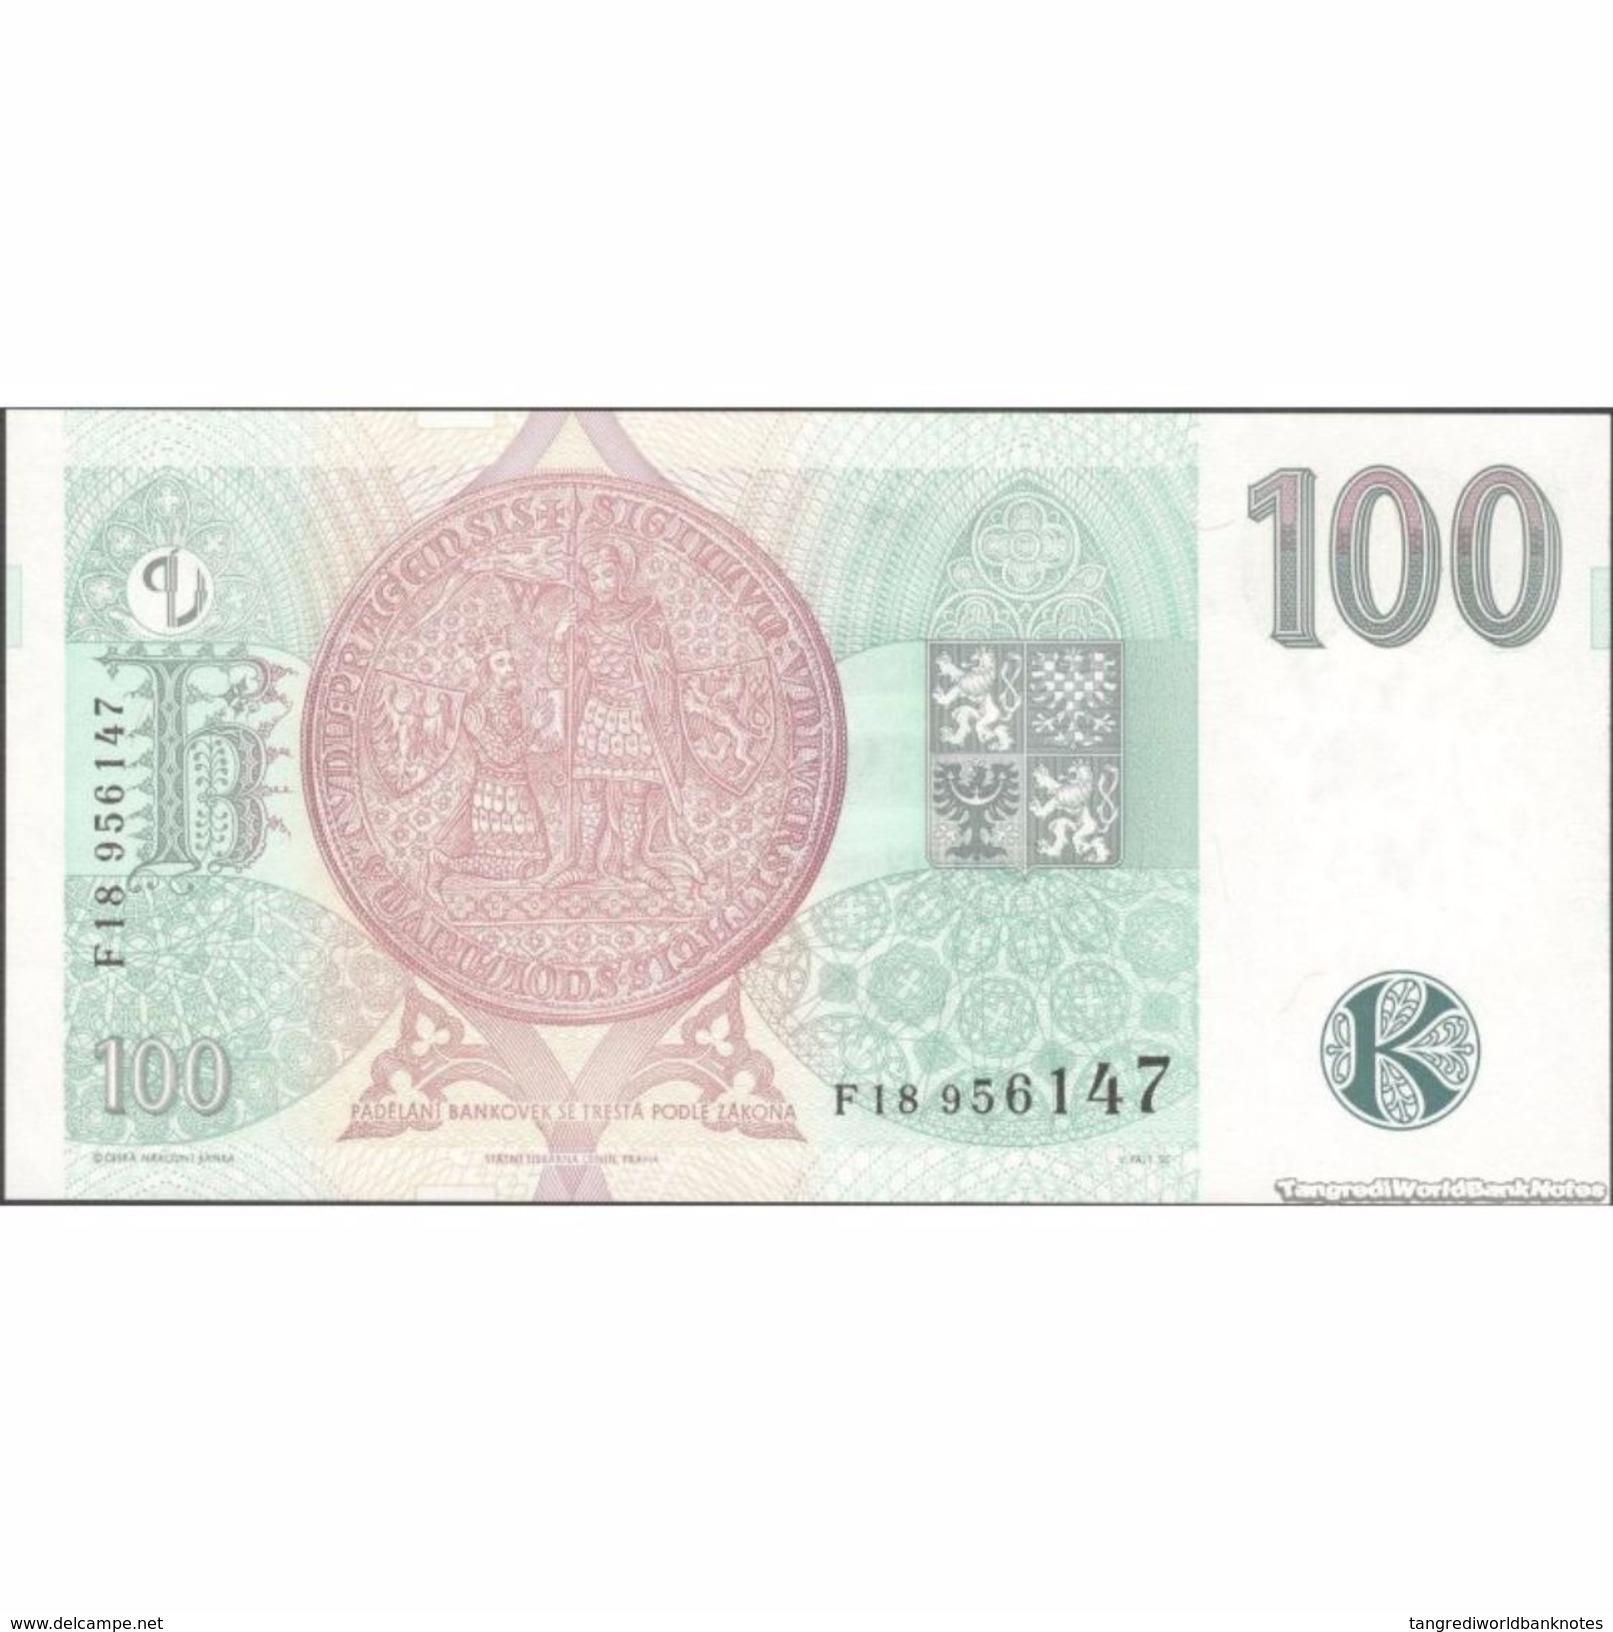 TWN - CZECH REPUBLIC 18a - 100 Korun Ceskych 1997 Series F18 UNC - Repubblica Ceca